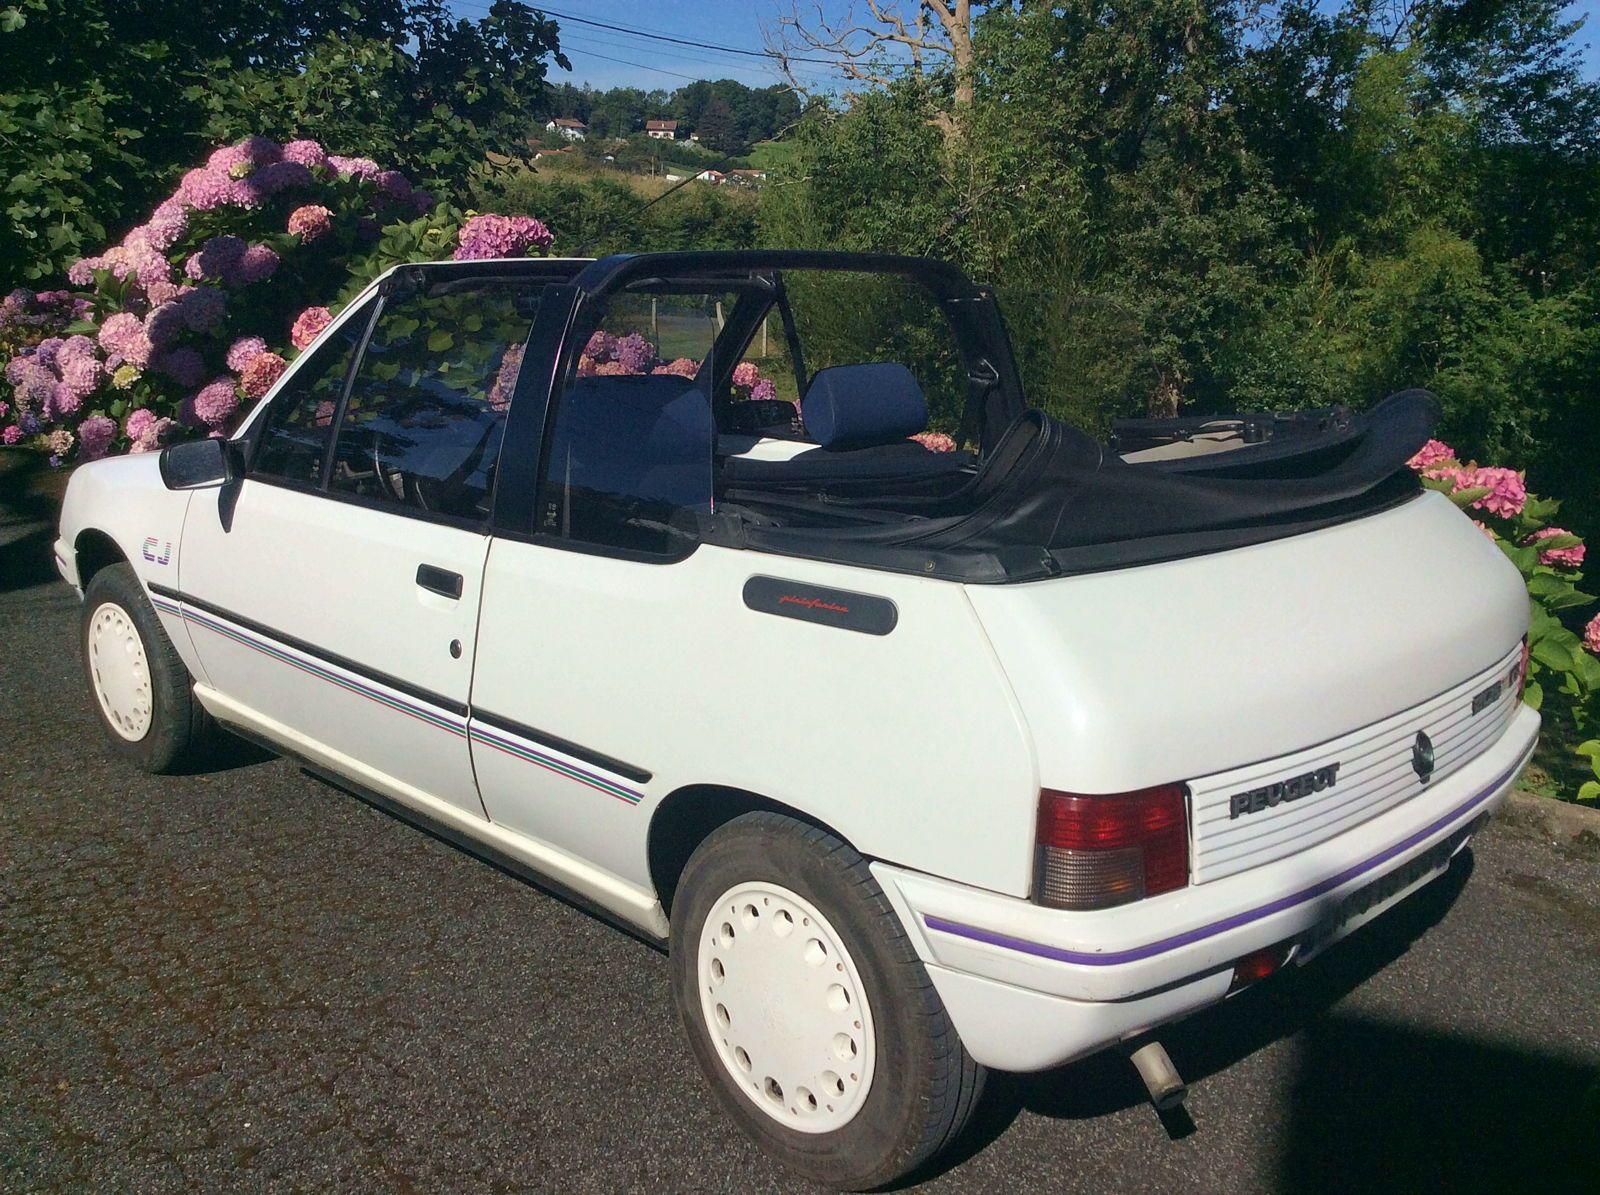 Vends Peugeot Cabriolet 205CJ - 1992, 107000km